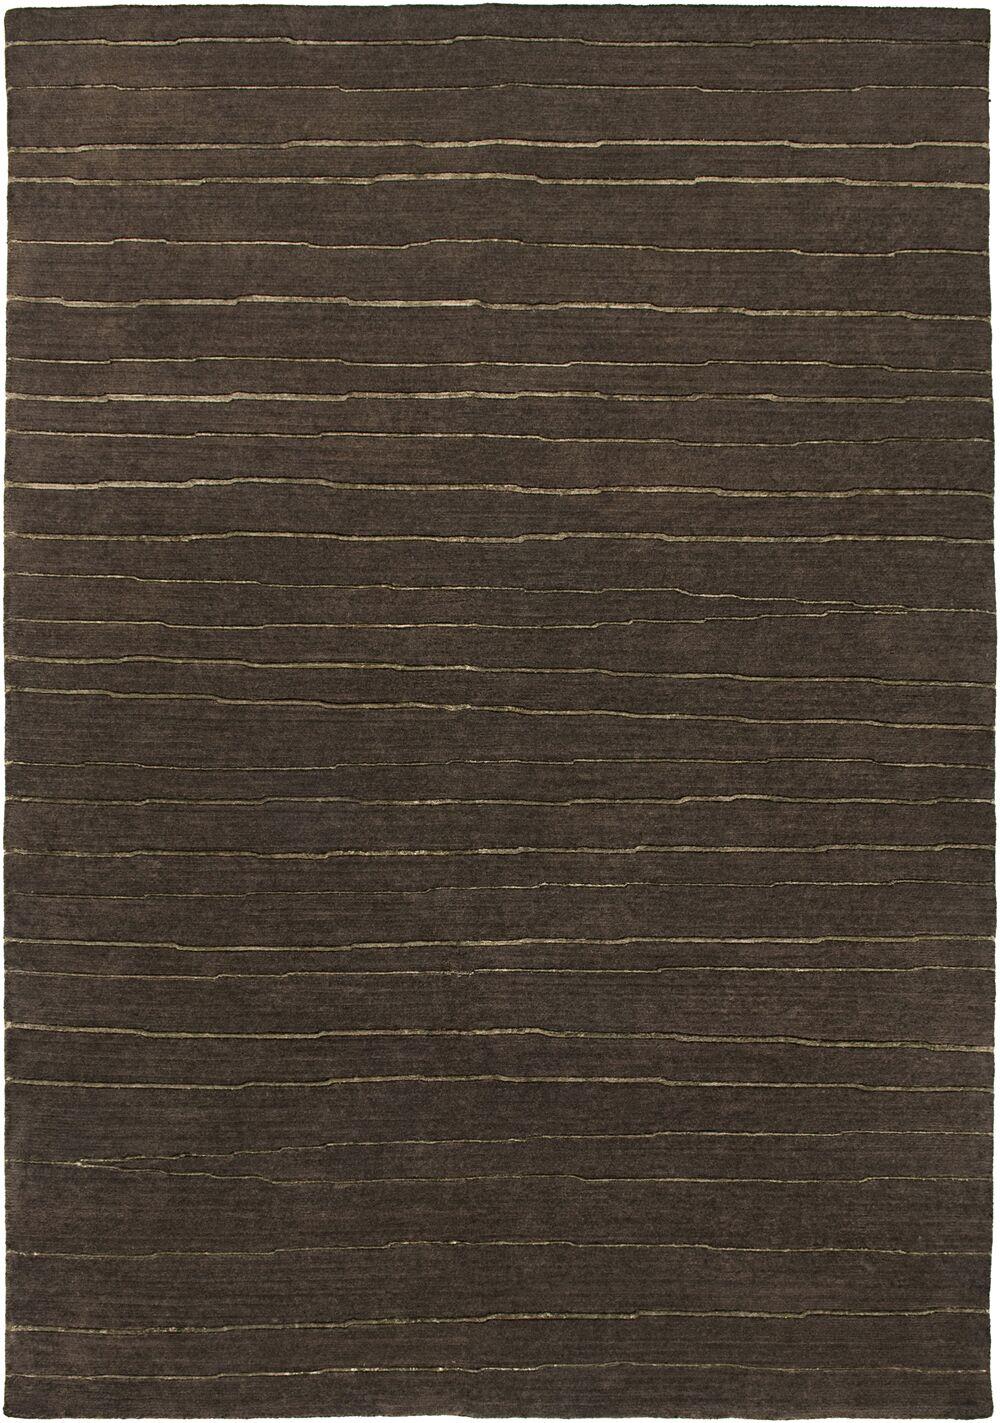 Visnagar Hand-Knotted Dark Brown Area Rug Rug Size: Rectangle 9' x 12'